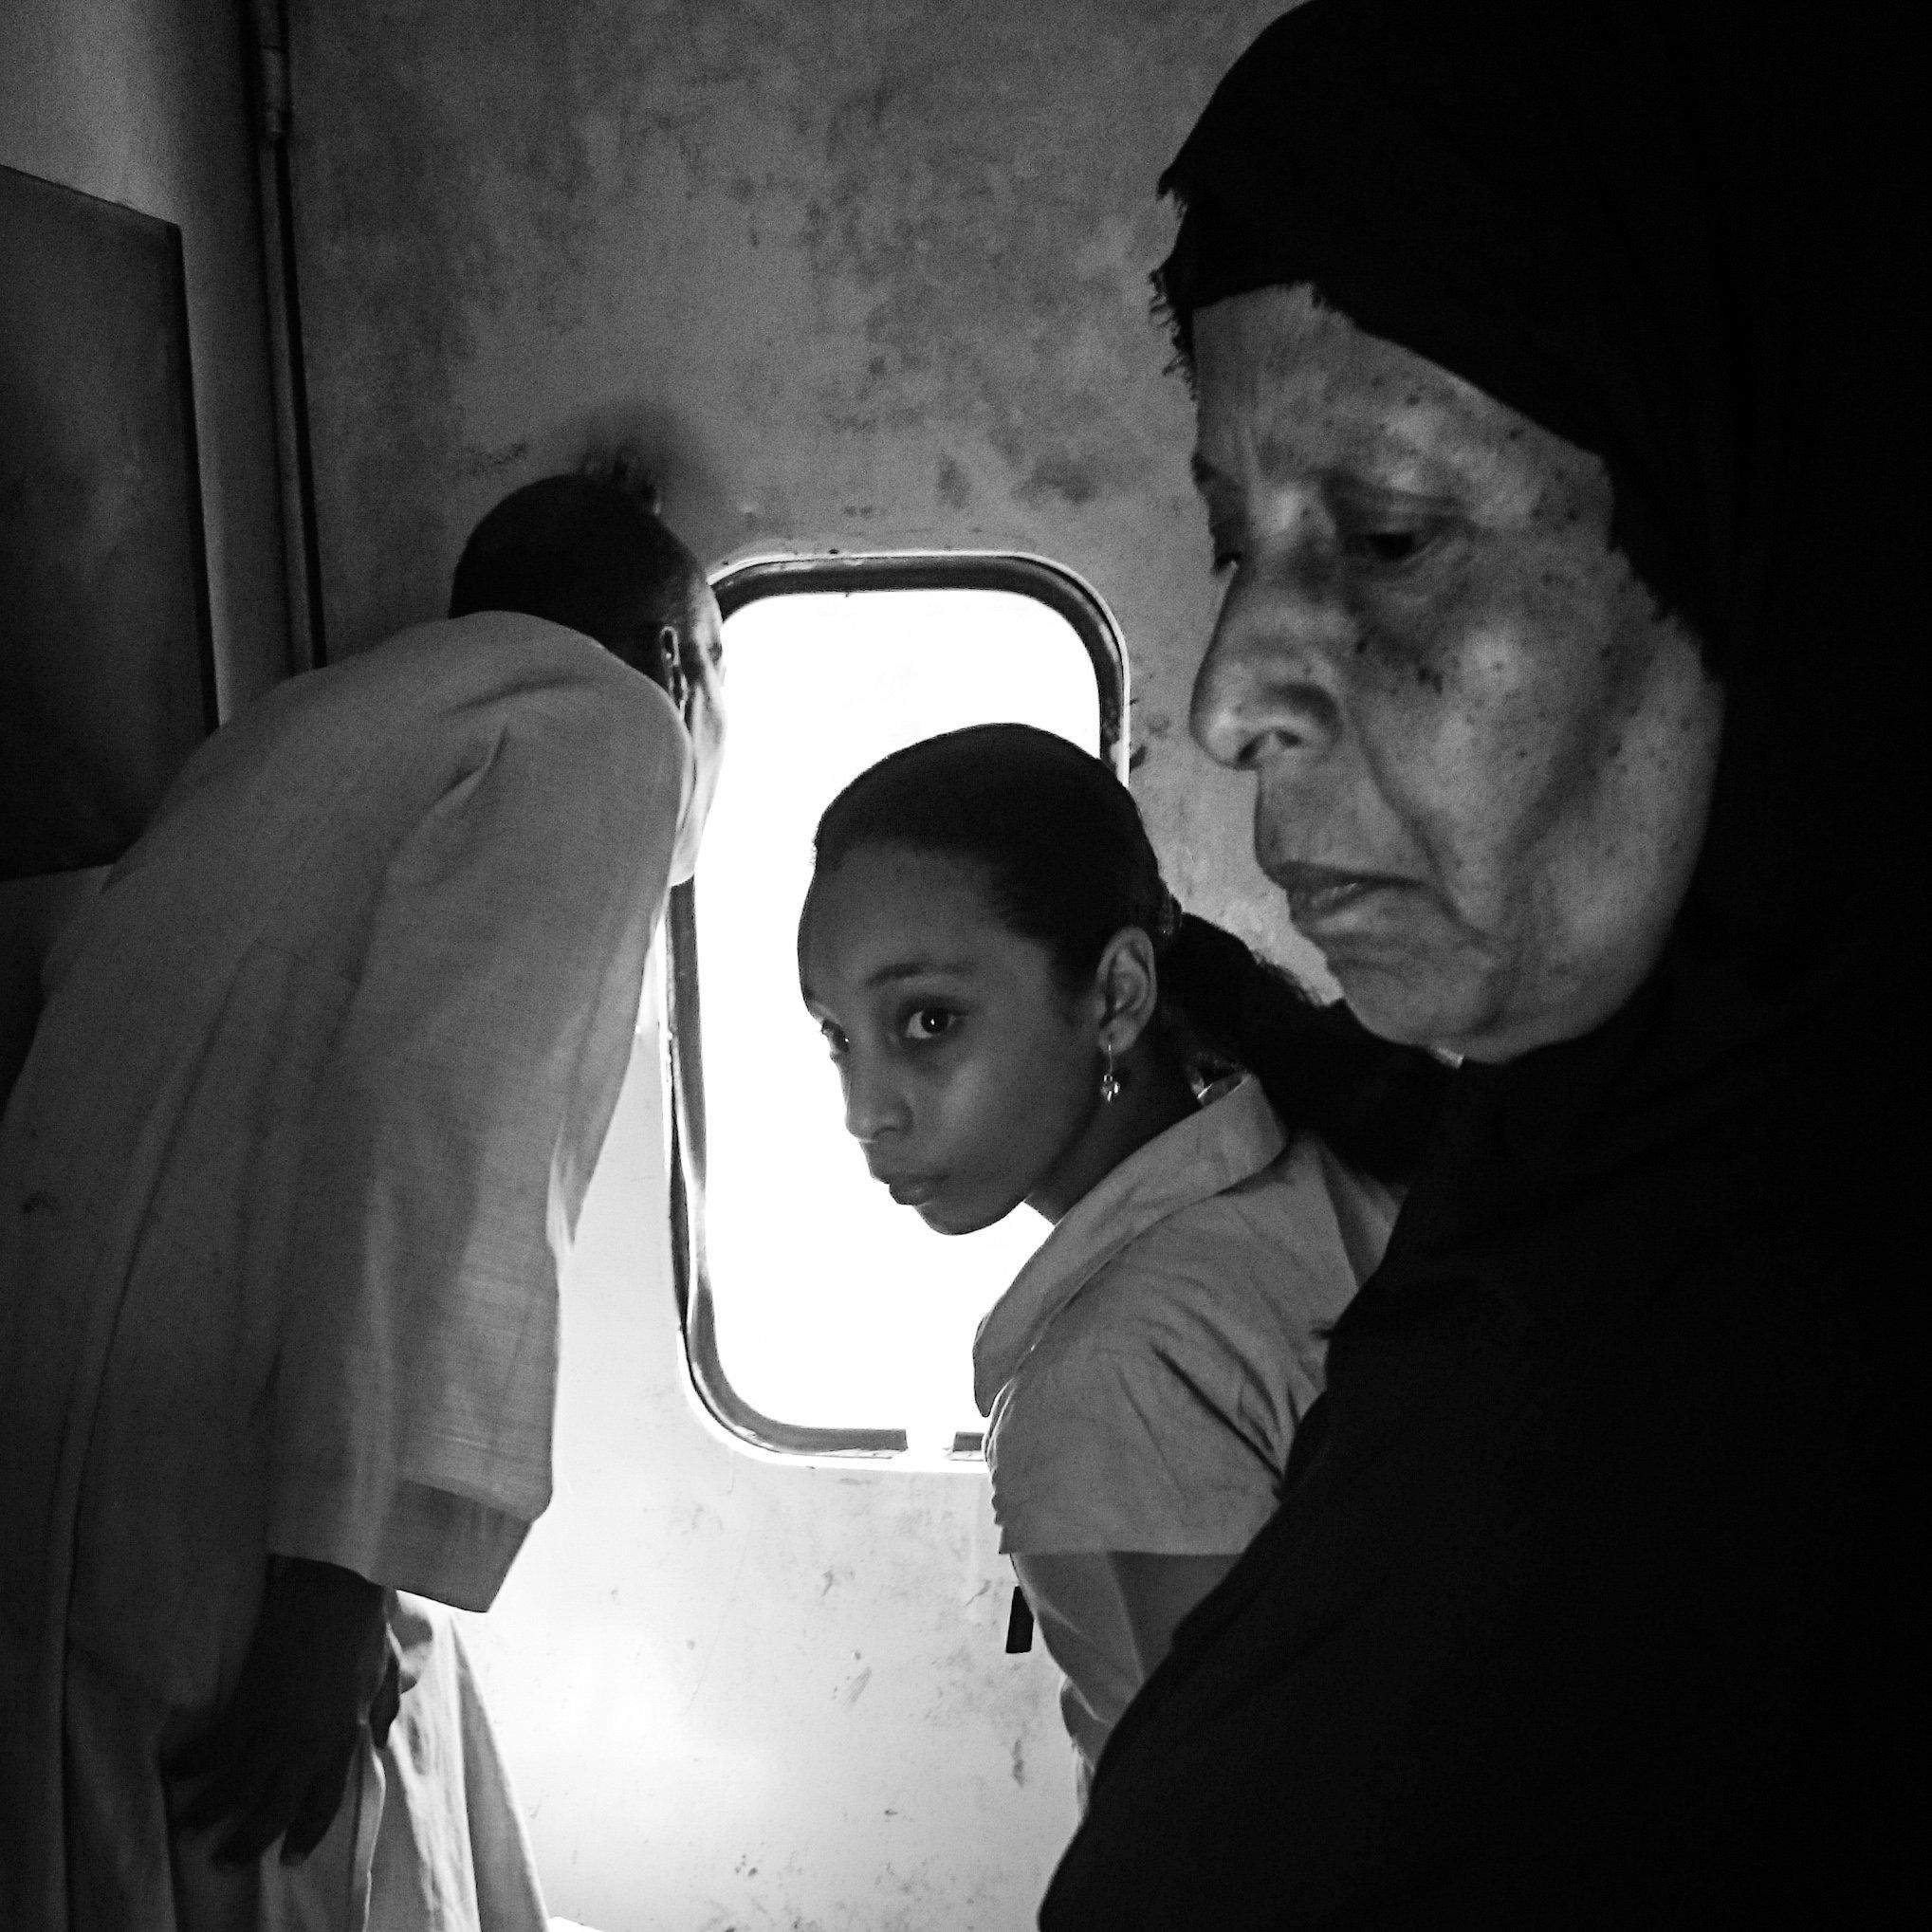 Photo: Mahmoud Ahmed